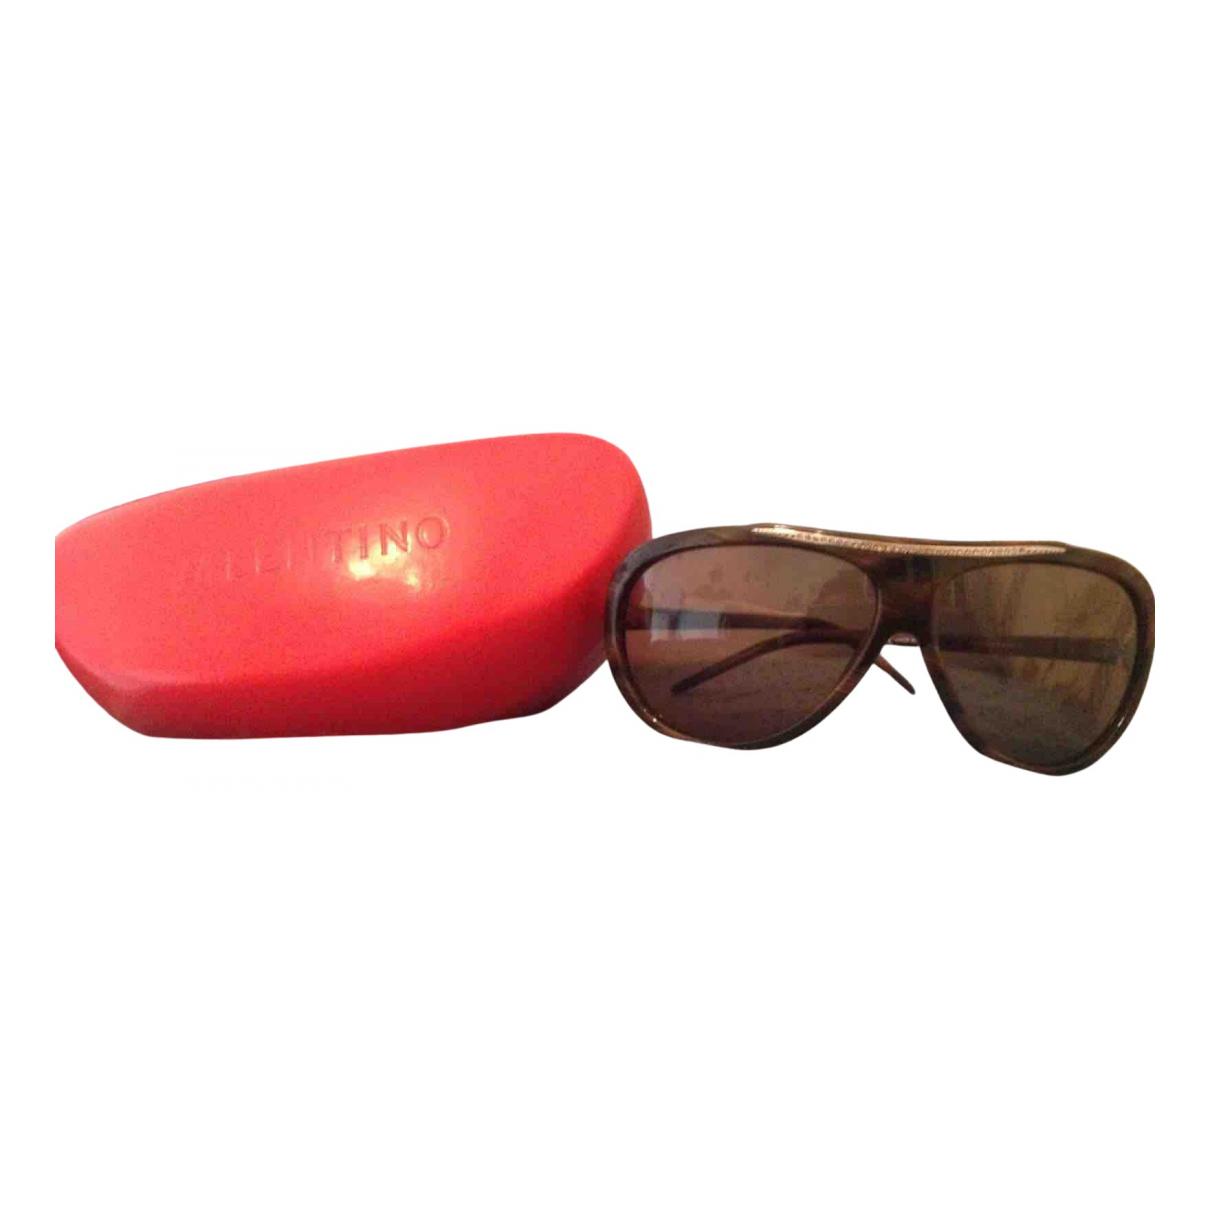 Valentino Garavani N Brown Sunglasses for Women N